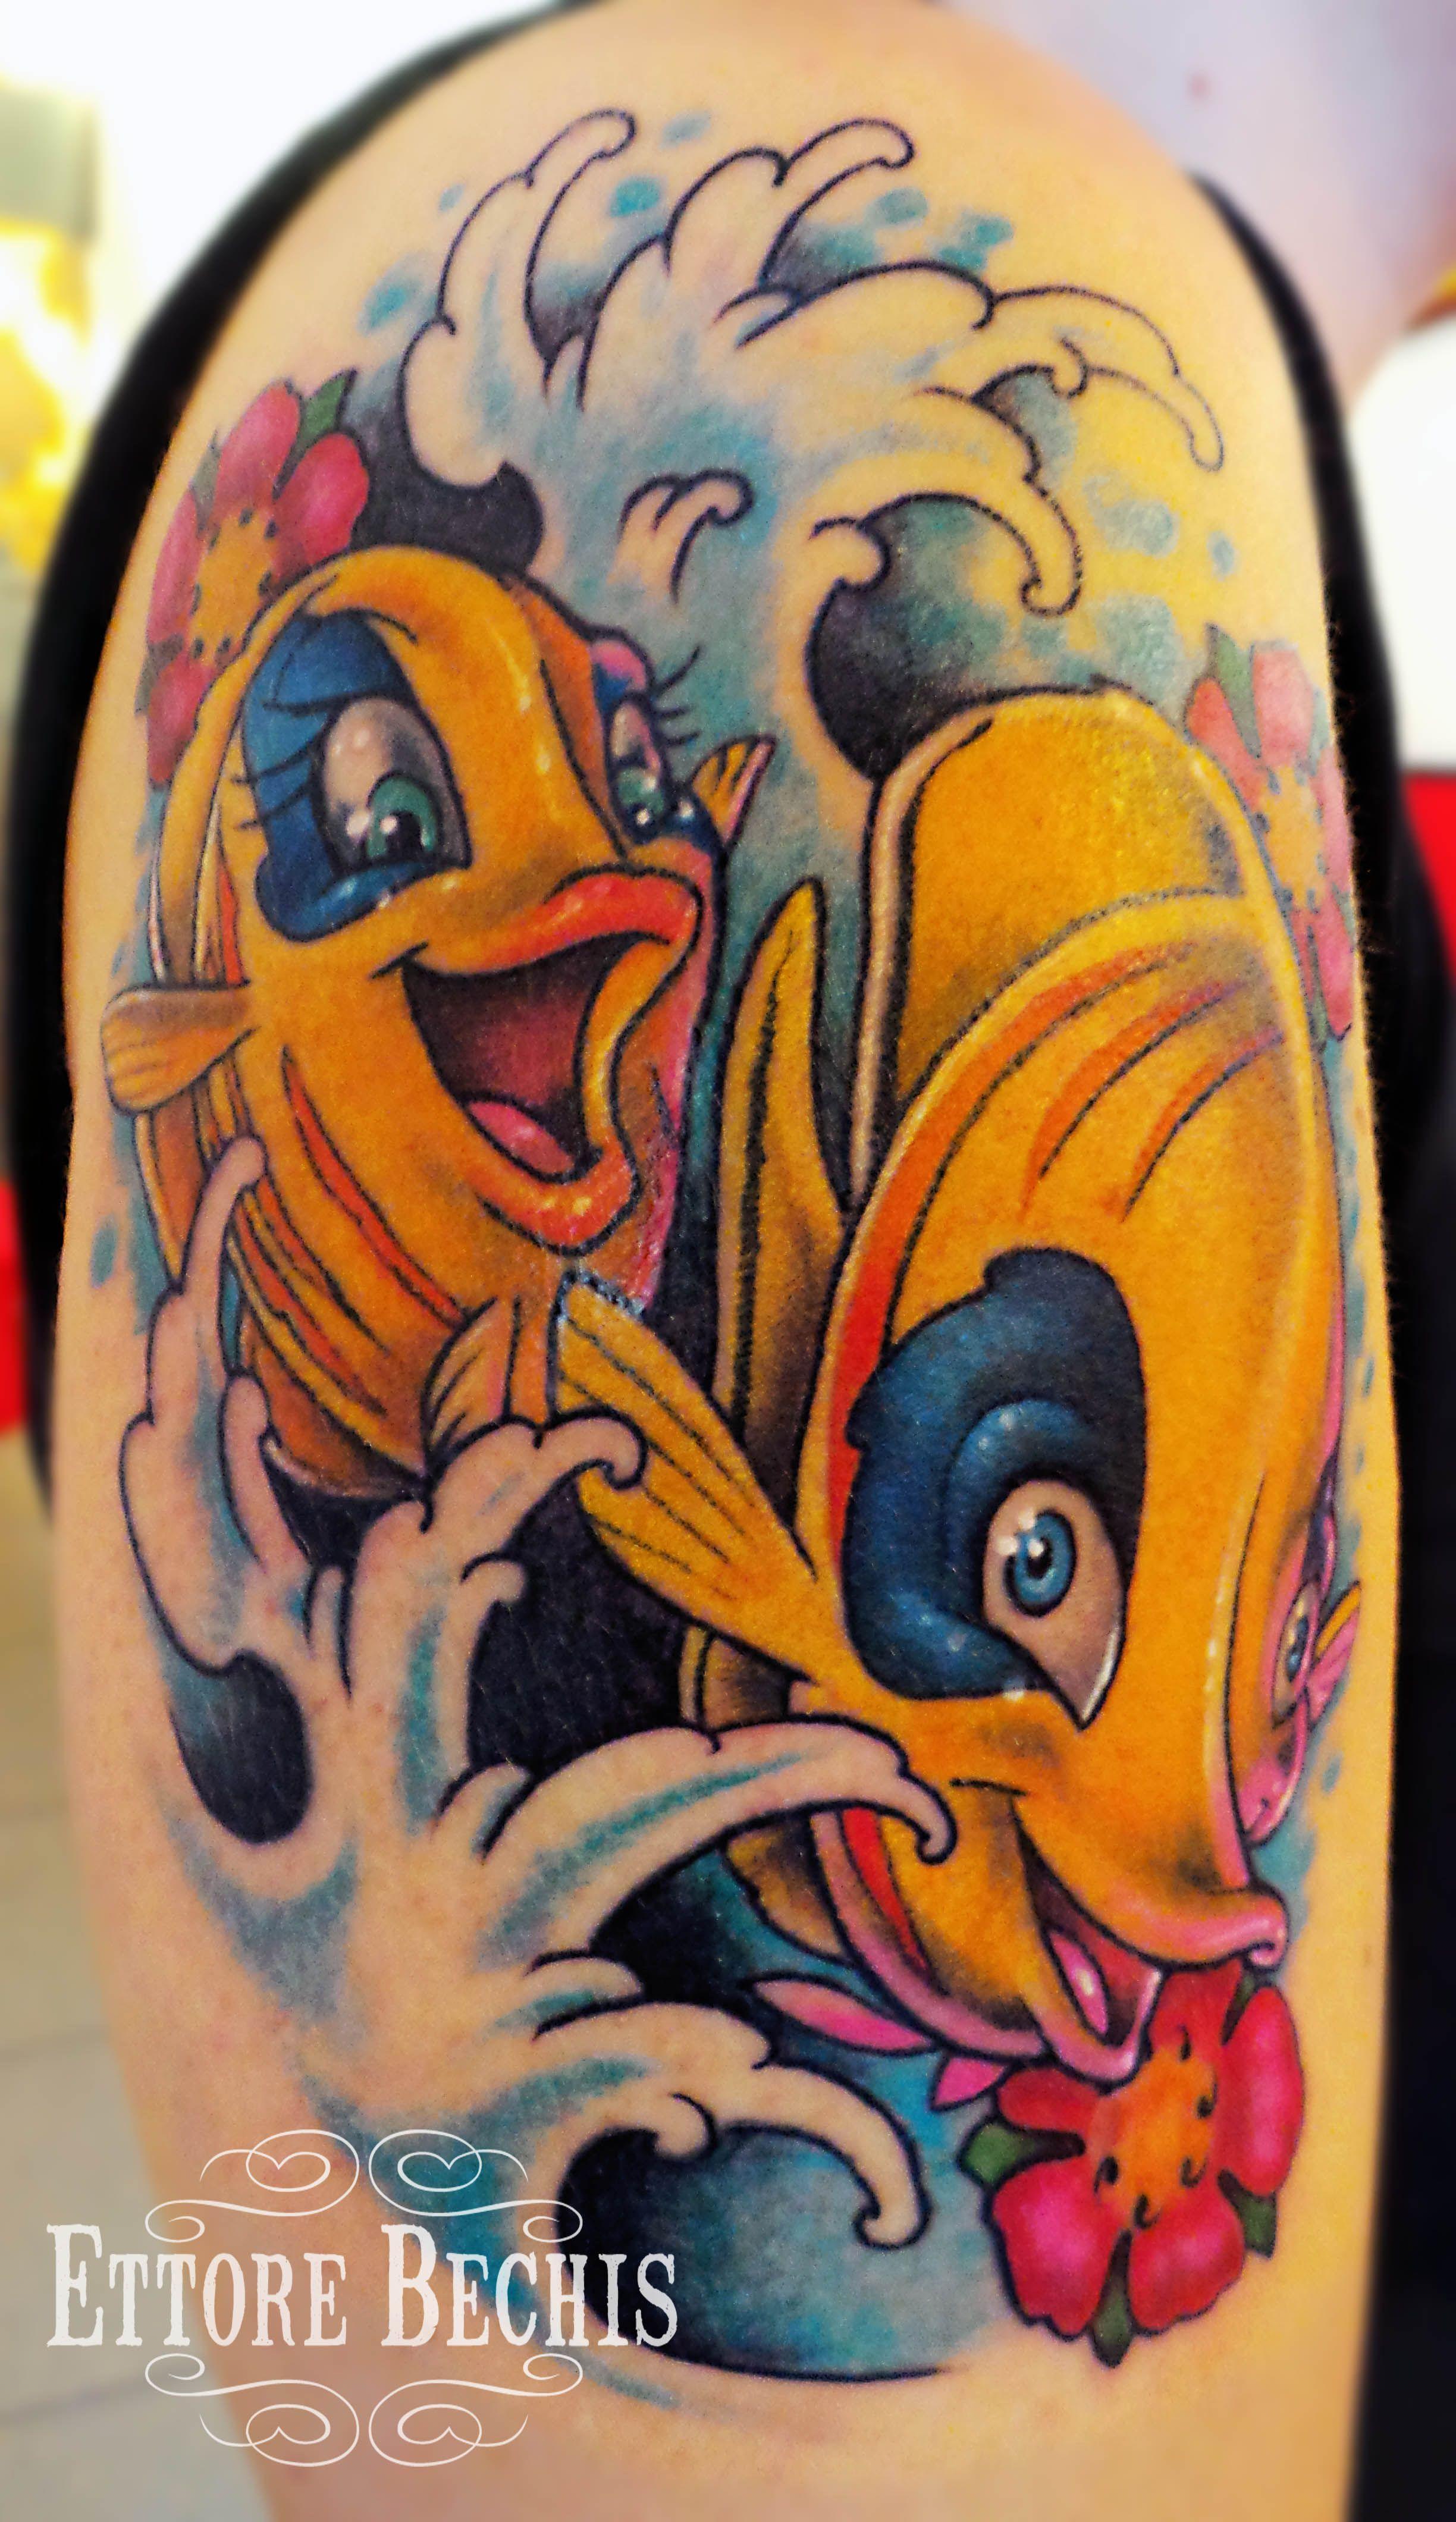 www.ettore-bechis.com Best Miami tattoo shop fish,cartoon,cherry ...